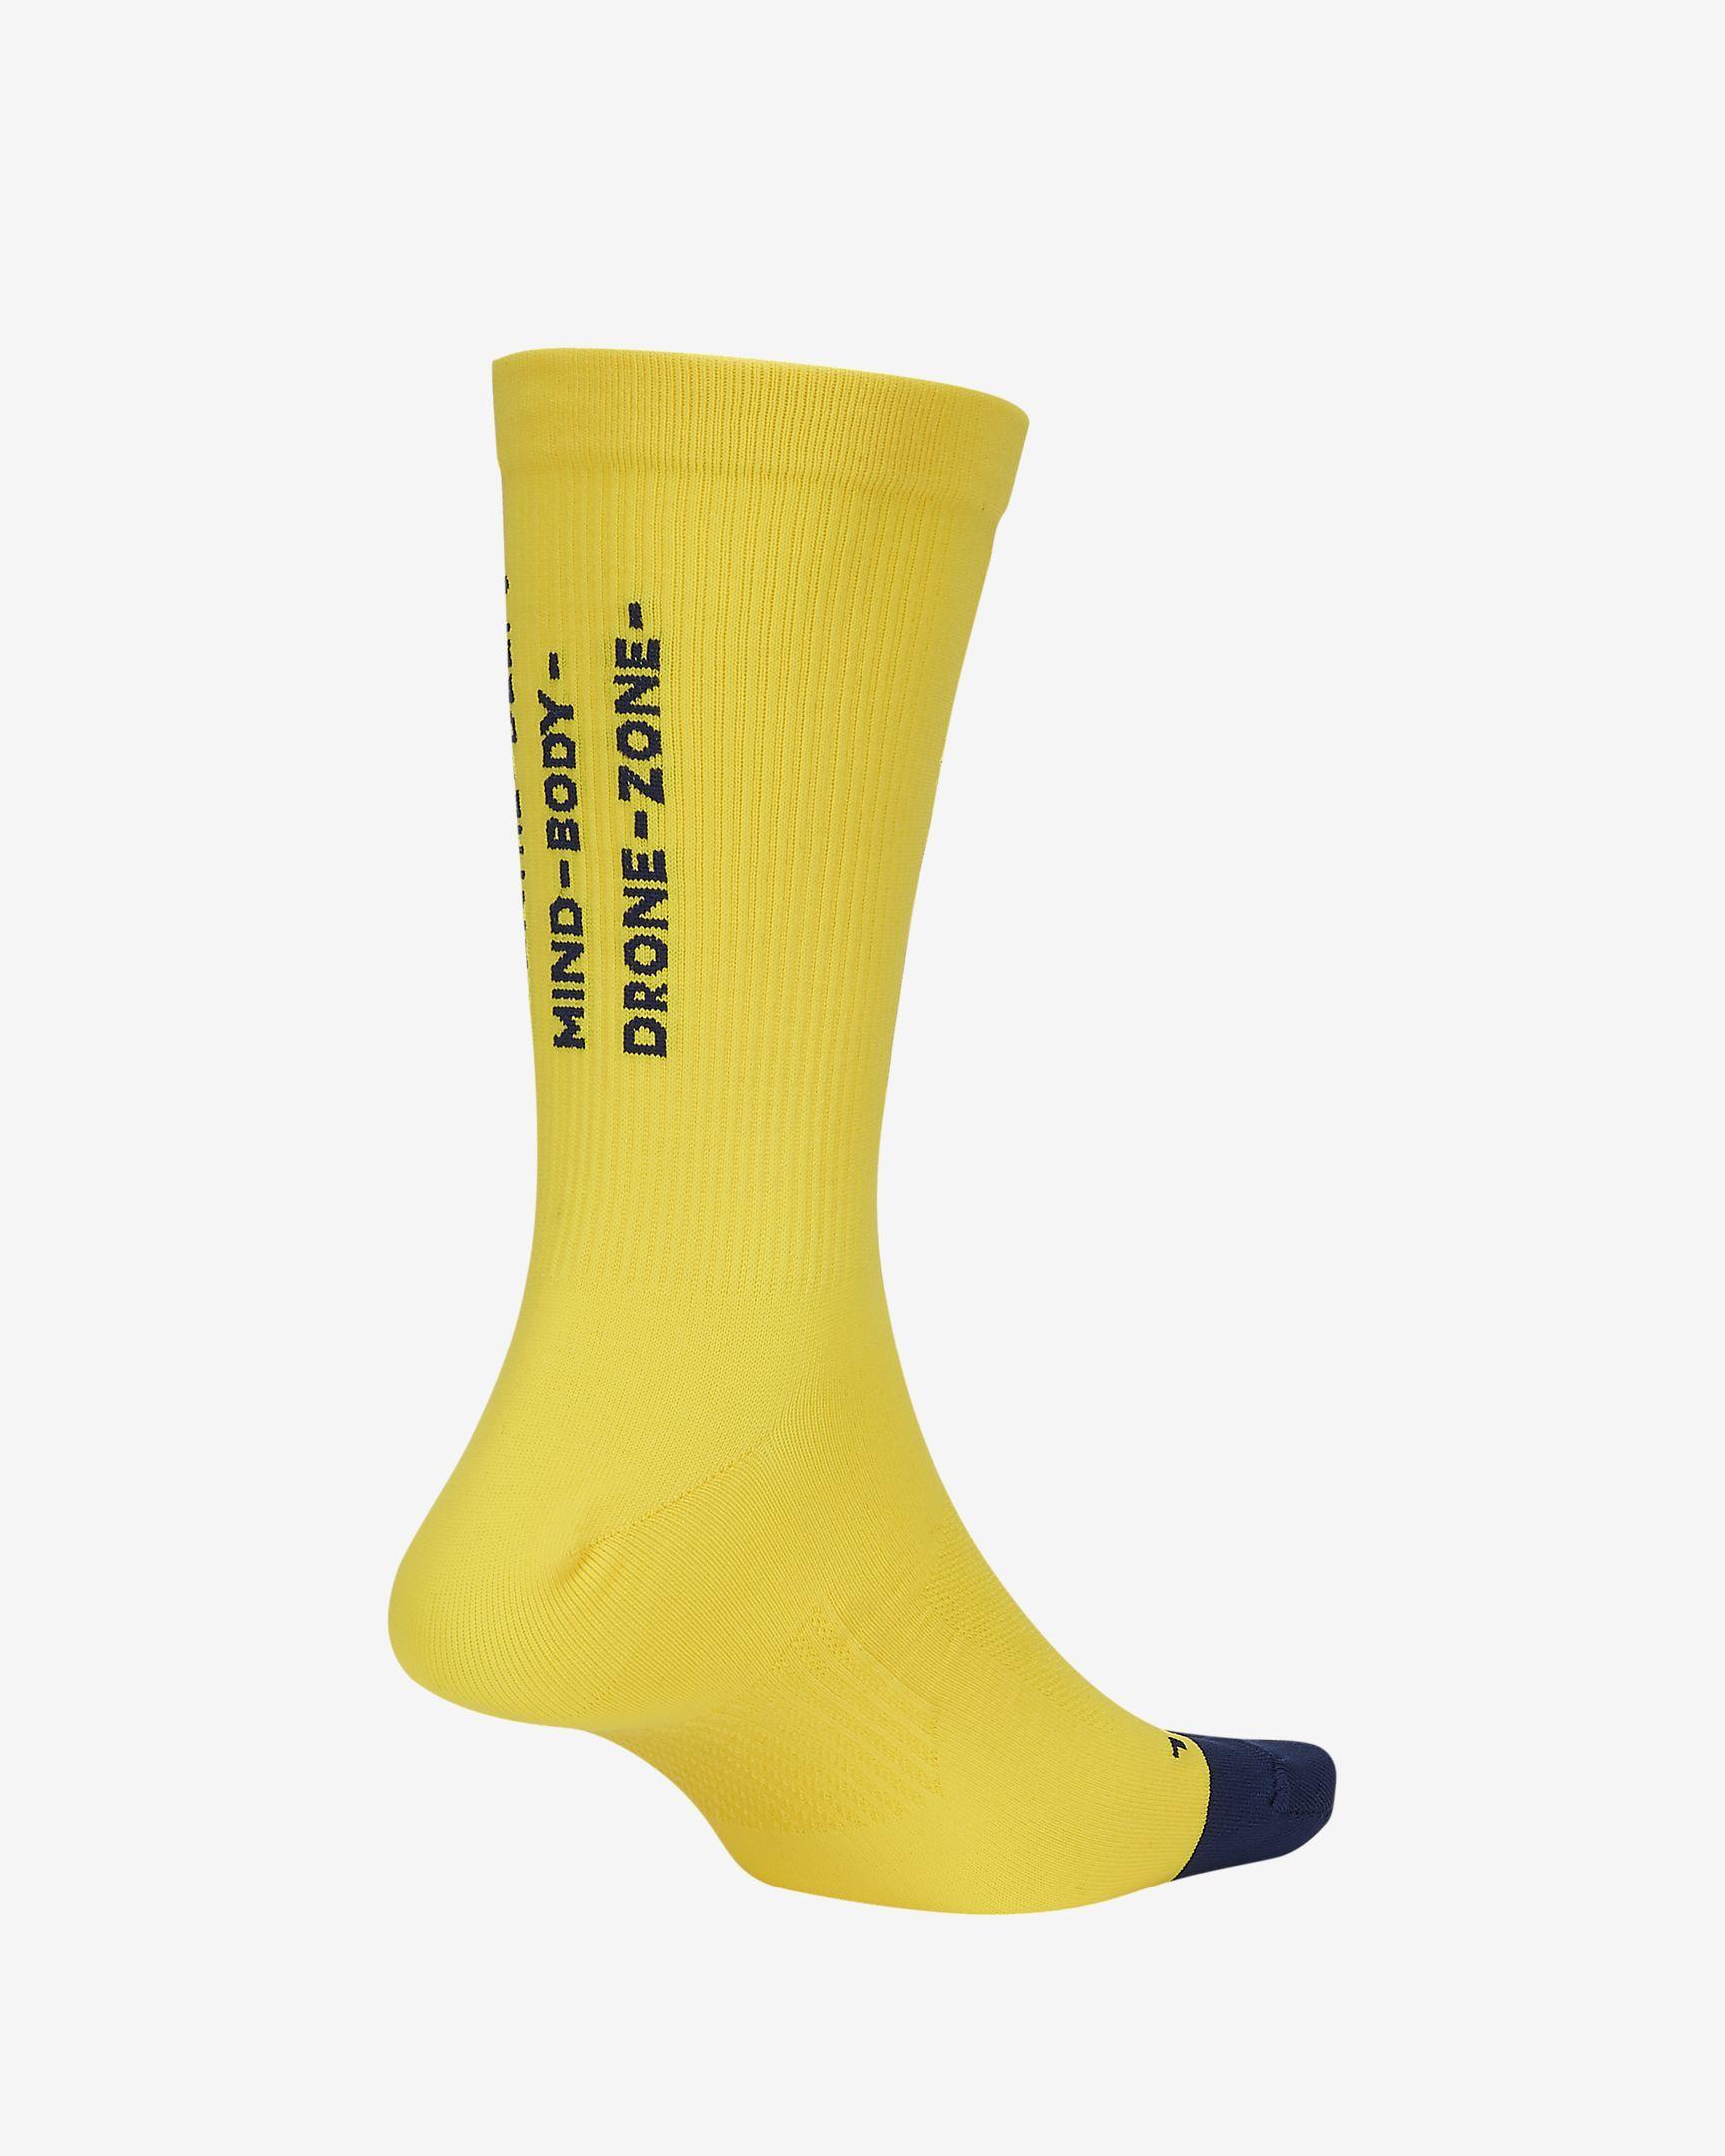 fermaglio pollice Artigiano  Nike Spark Lightweight Crew Graphic Running Sock